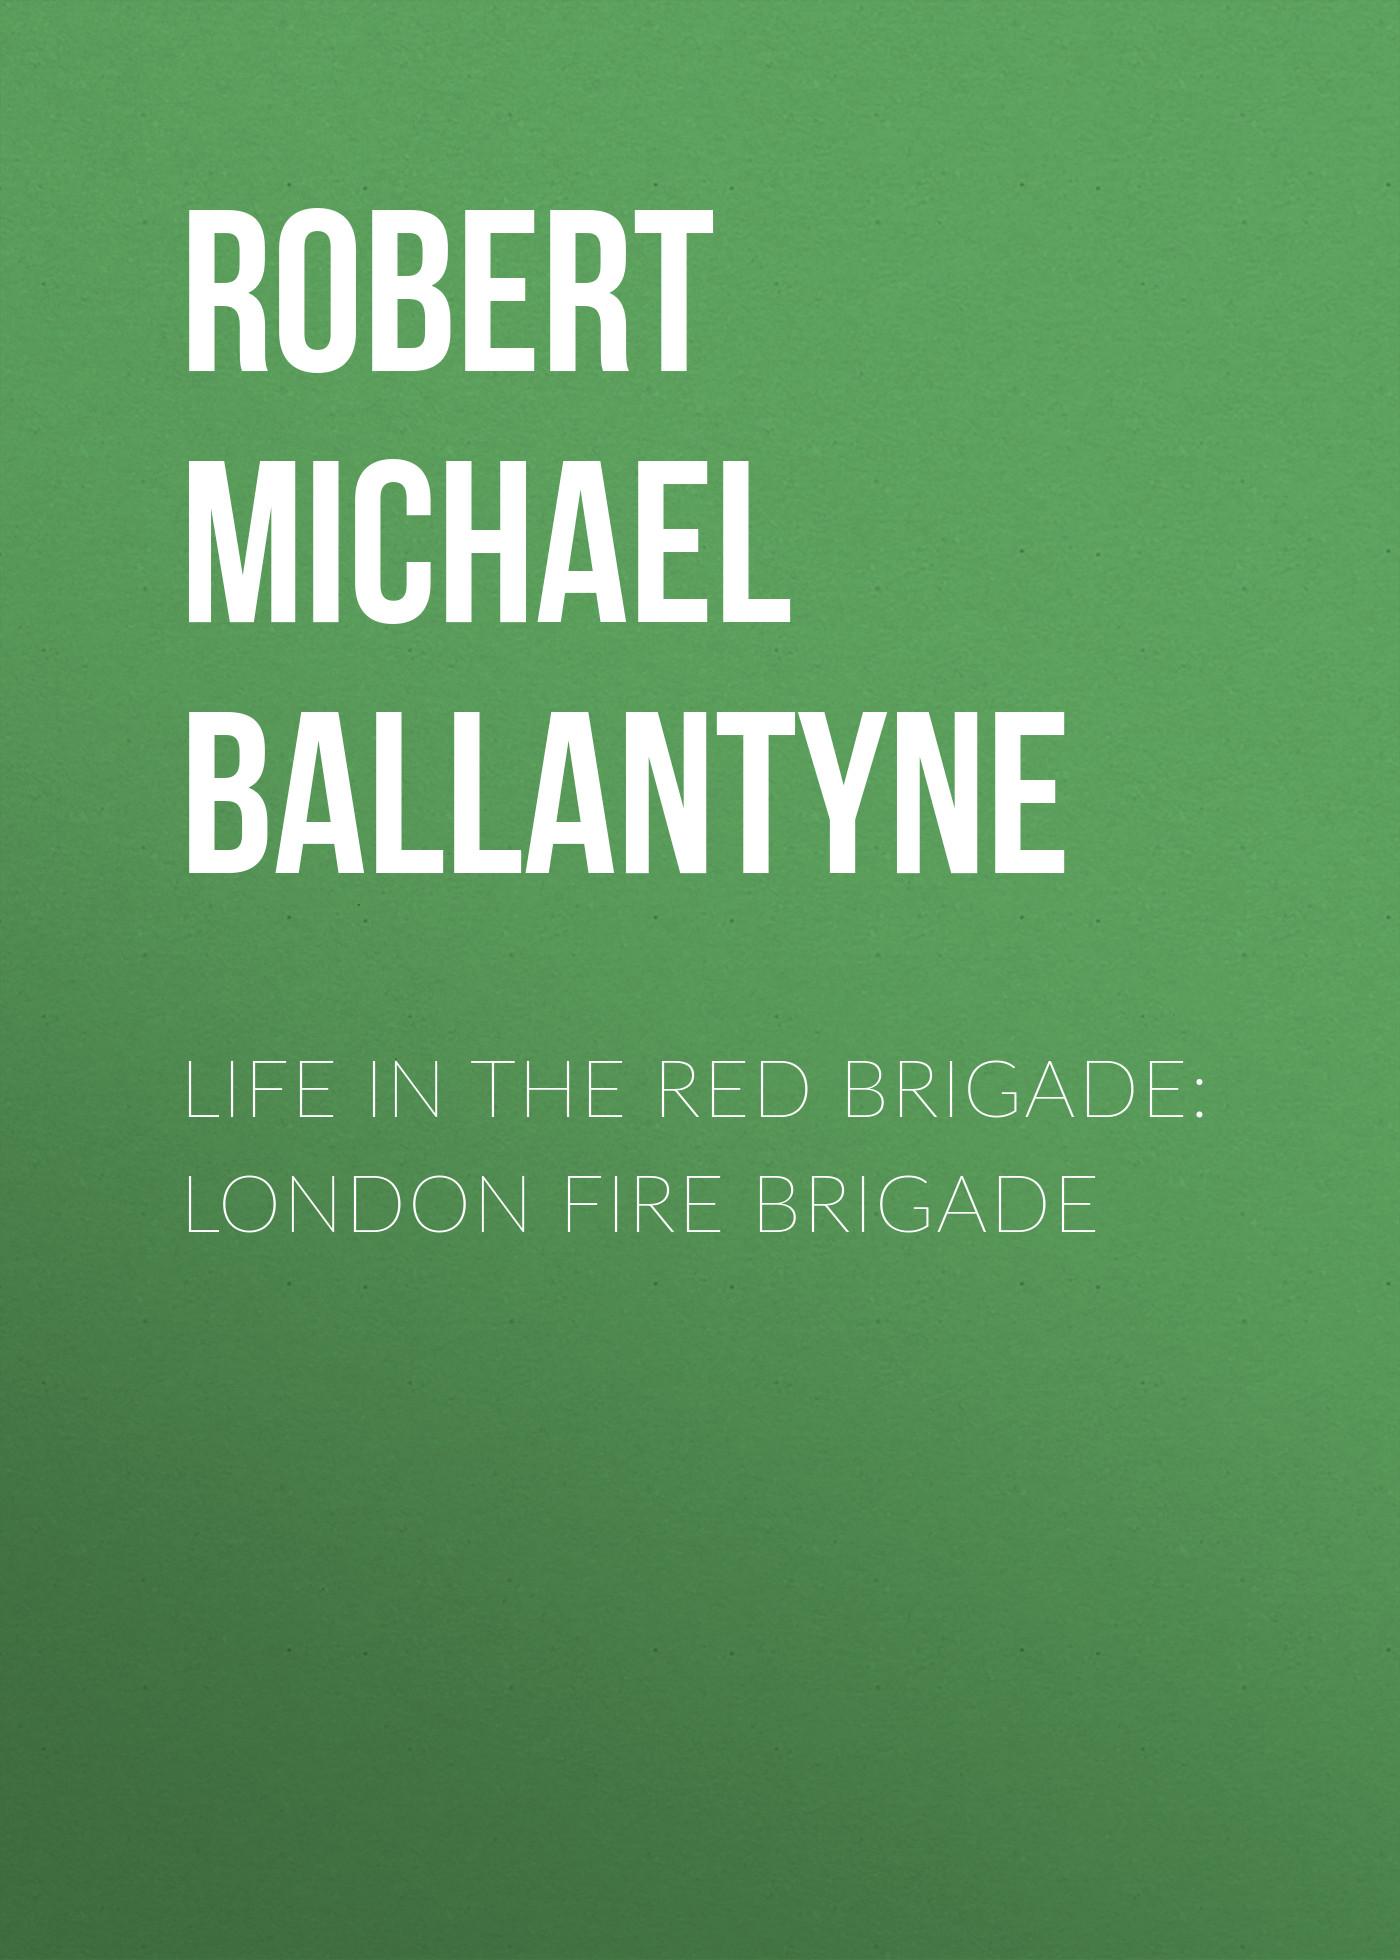 Robert Michael Ballantyne Life in the Red Brigade: London Fire Brigade